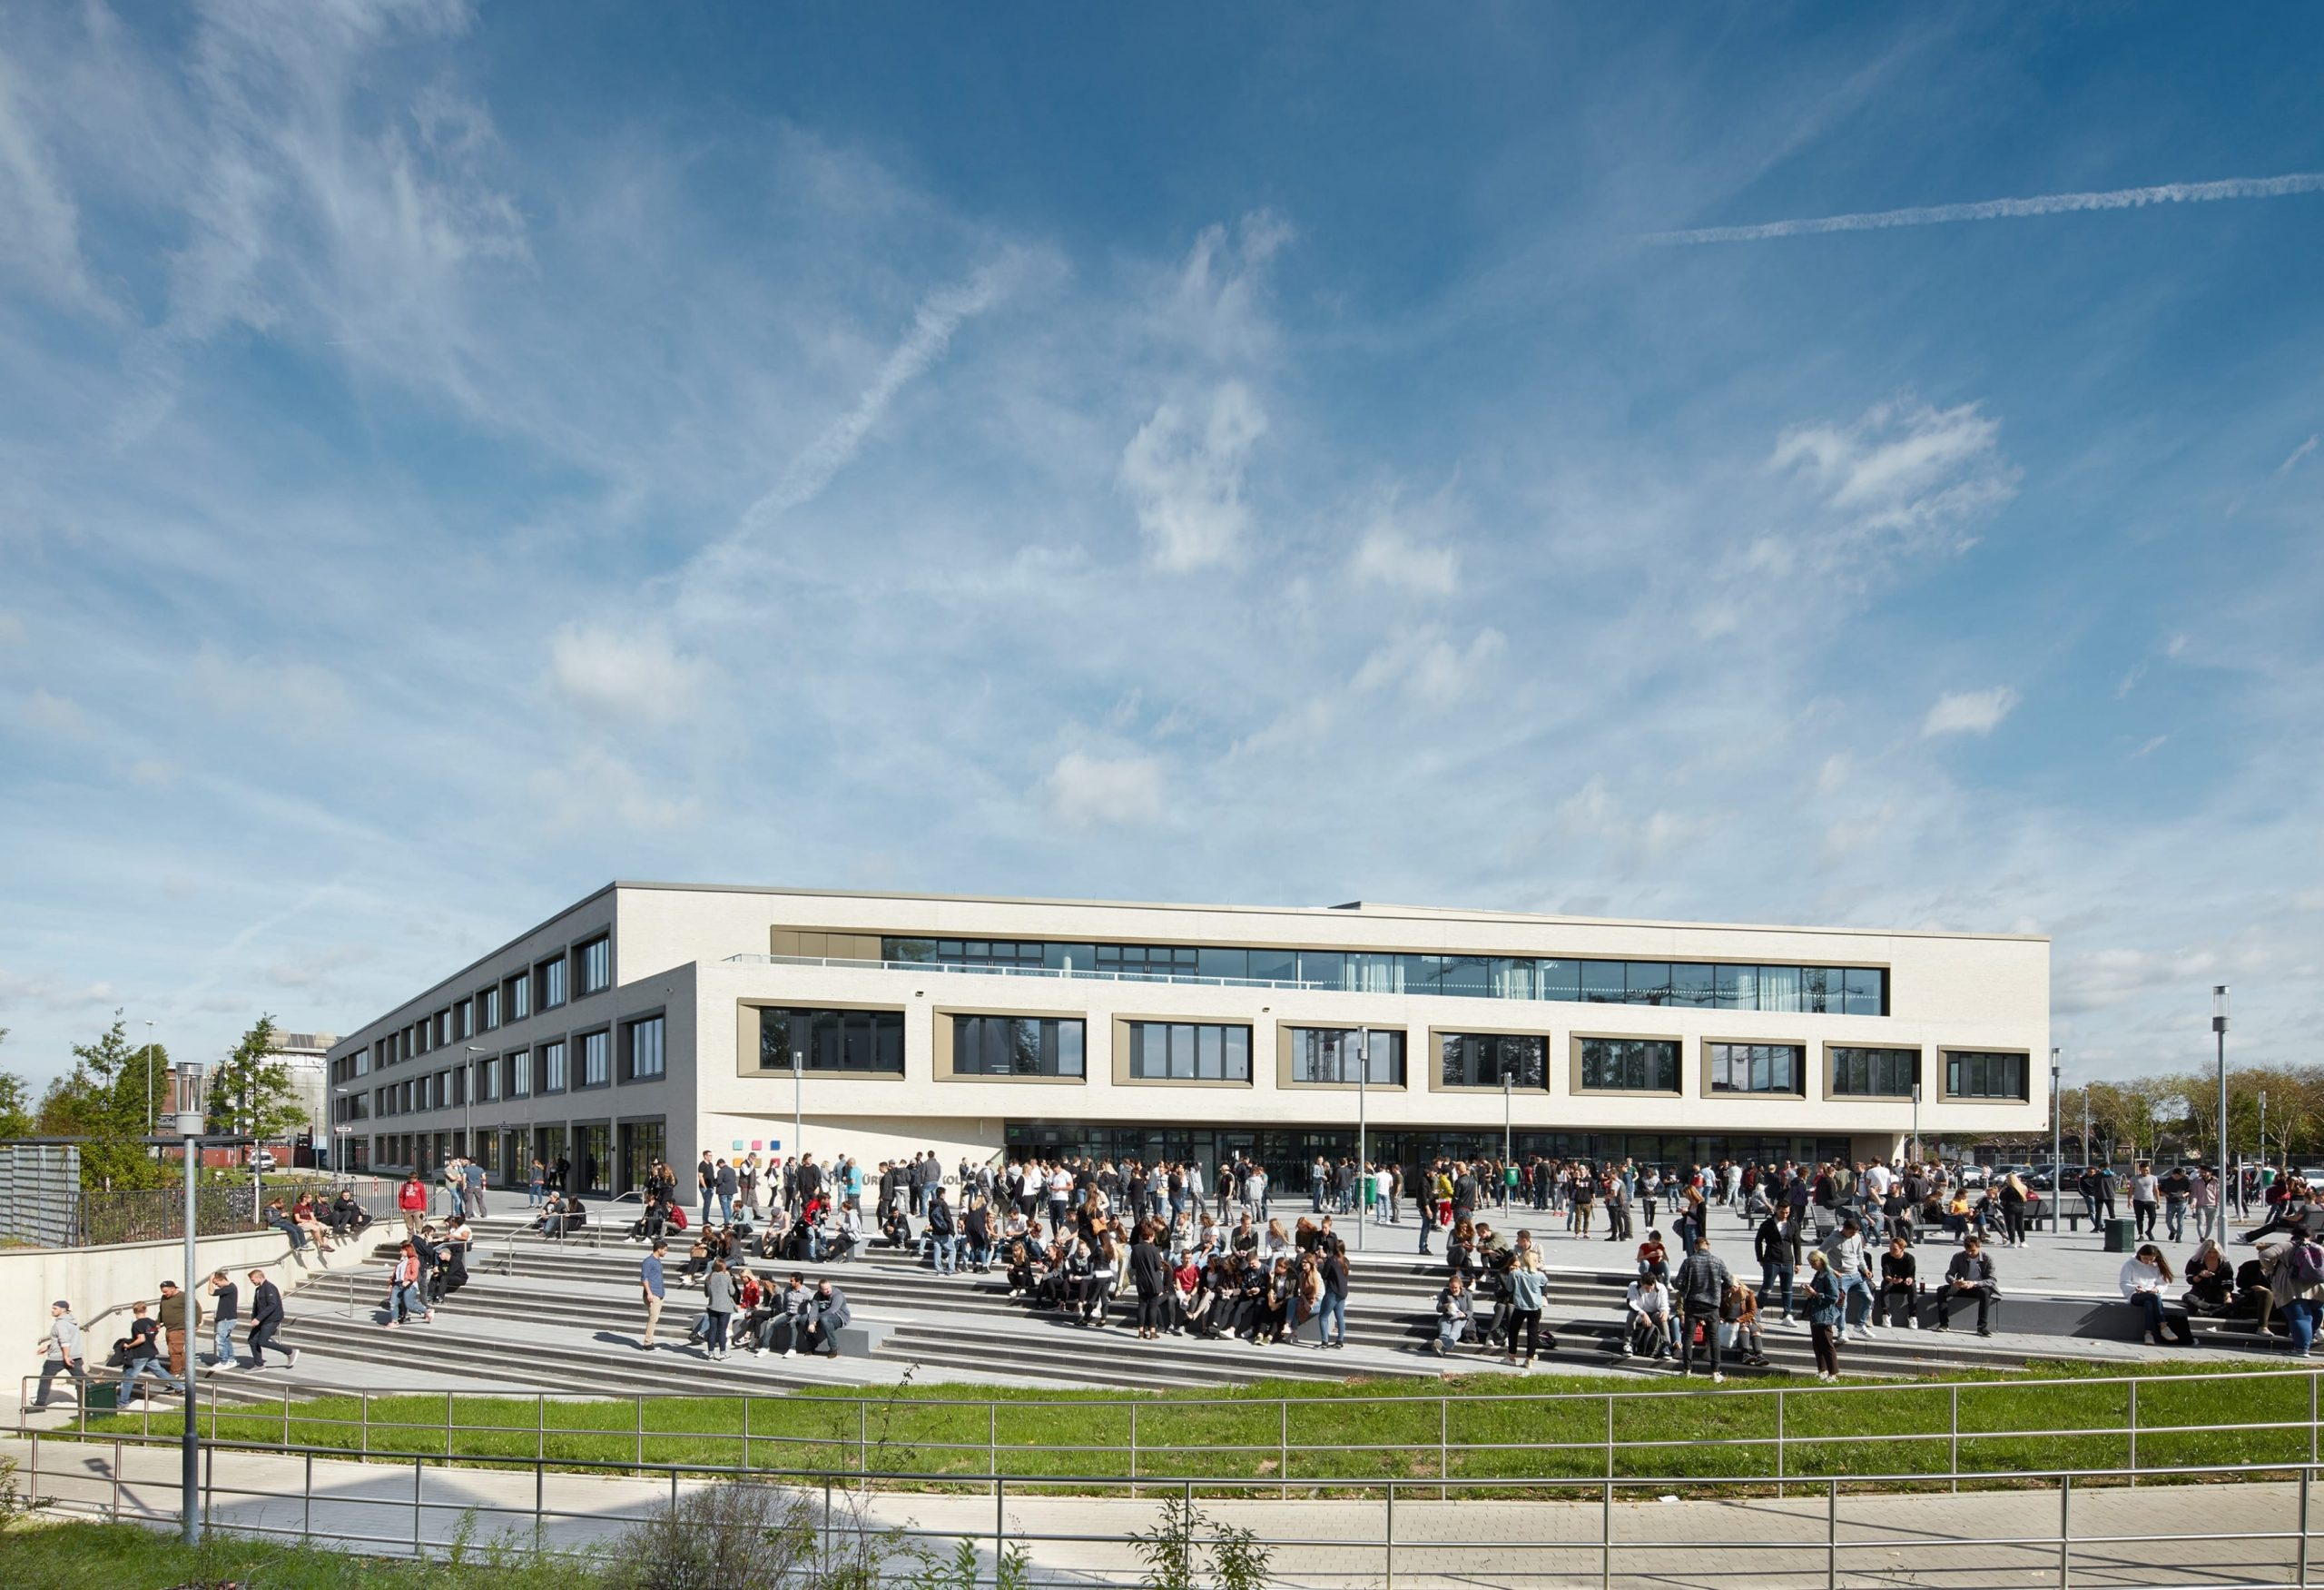 Albrecht-Dürer-Berufskolleg - Düsseldorf | Rkw Architektur + in Albrecht Dürer Schule Düsseldorf